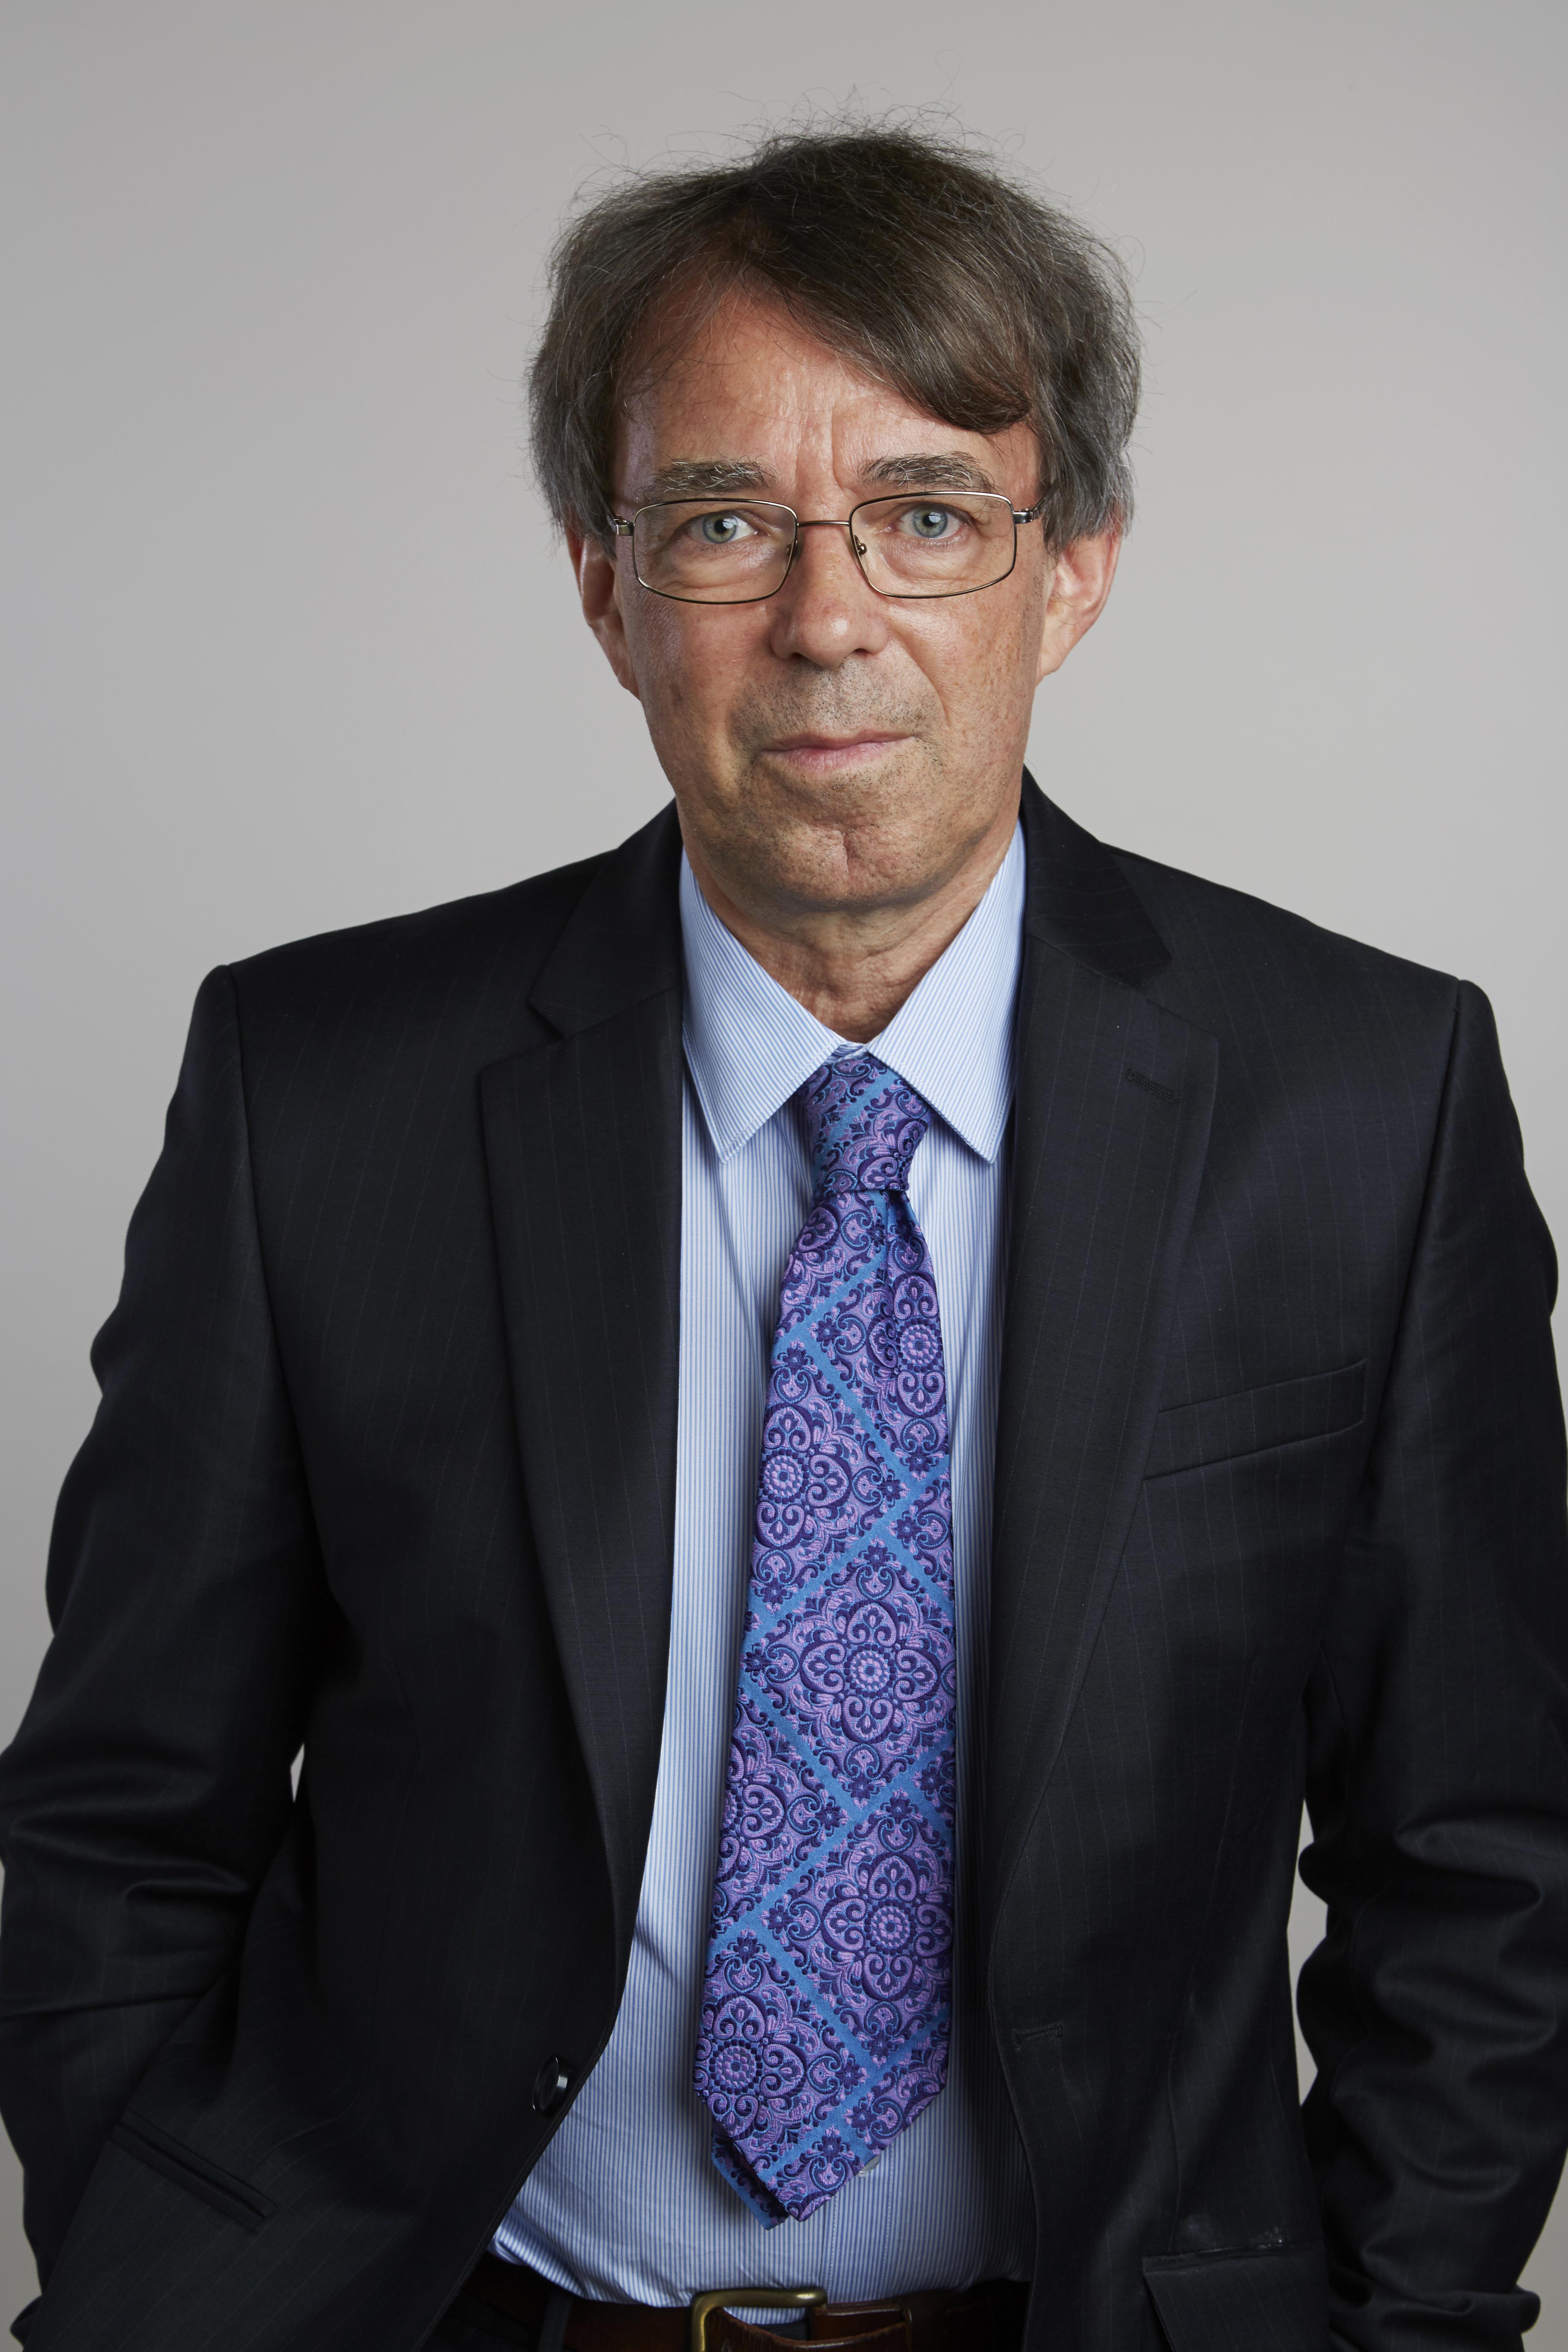 image of Stephen Anthony Cusack